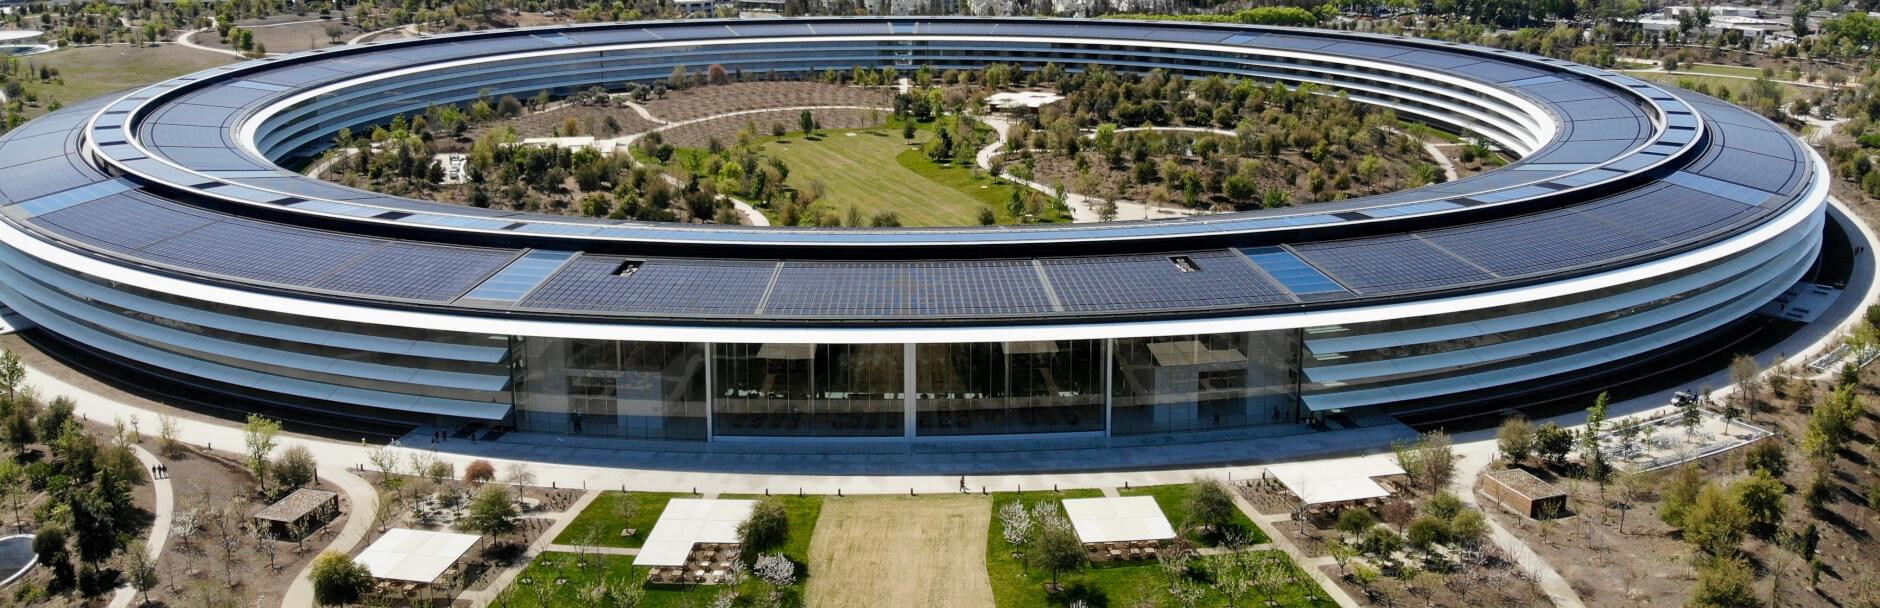 Plan Smart Buildings